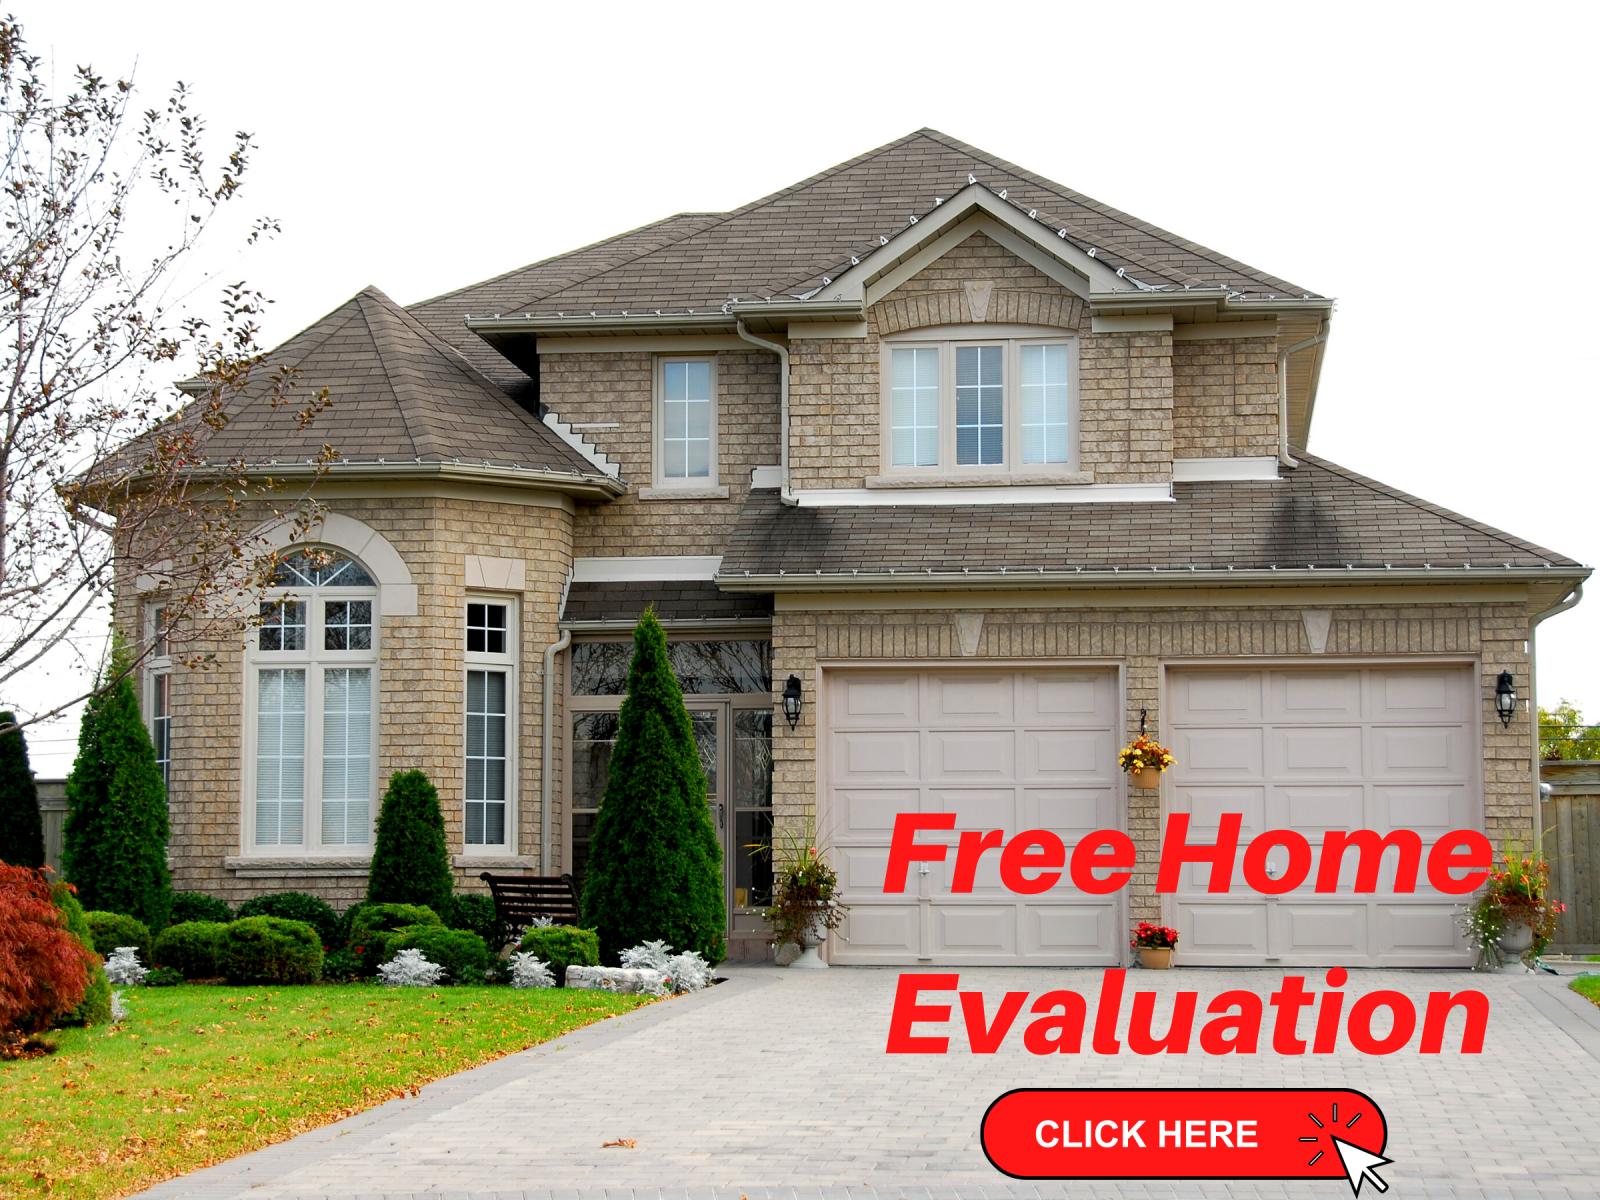 Burlington Free Home Evaluation